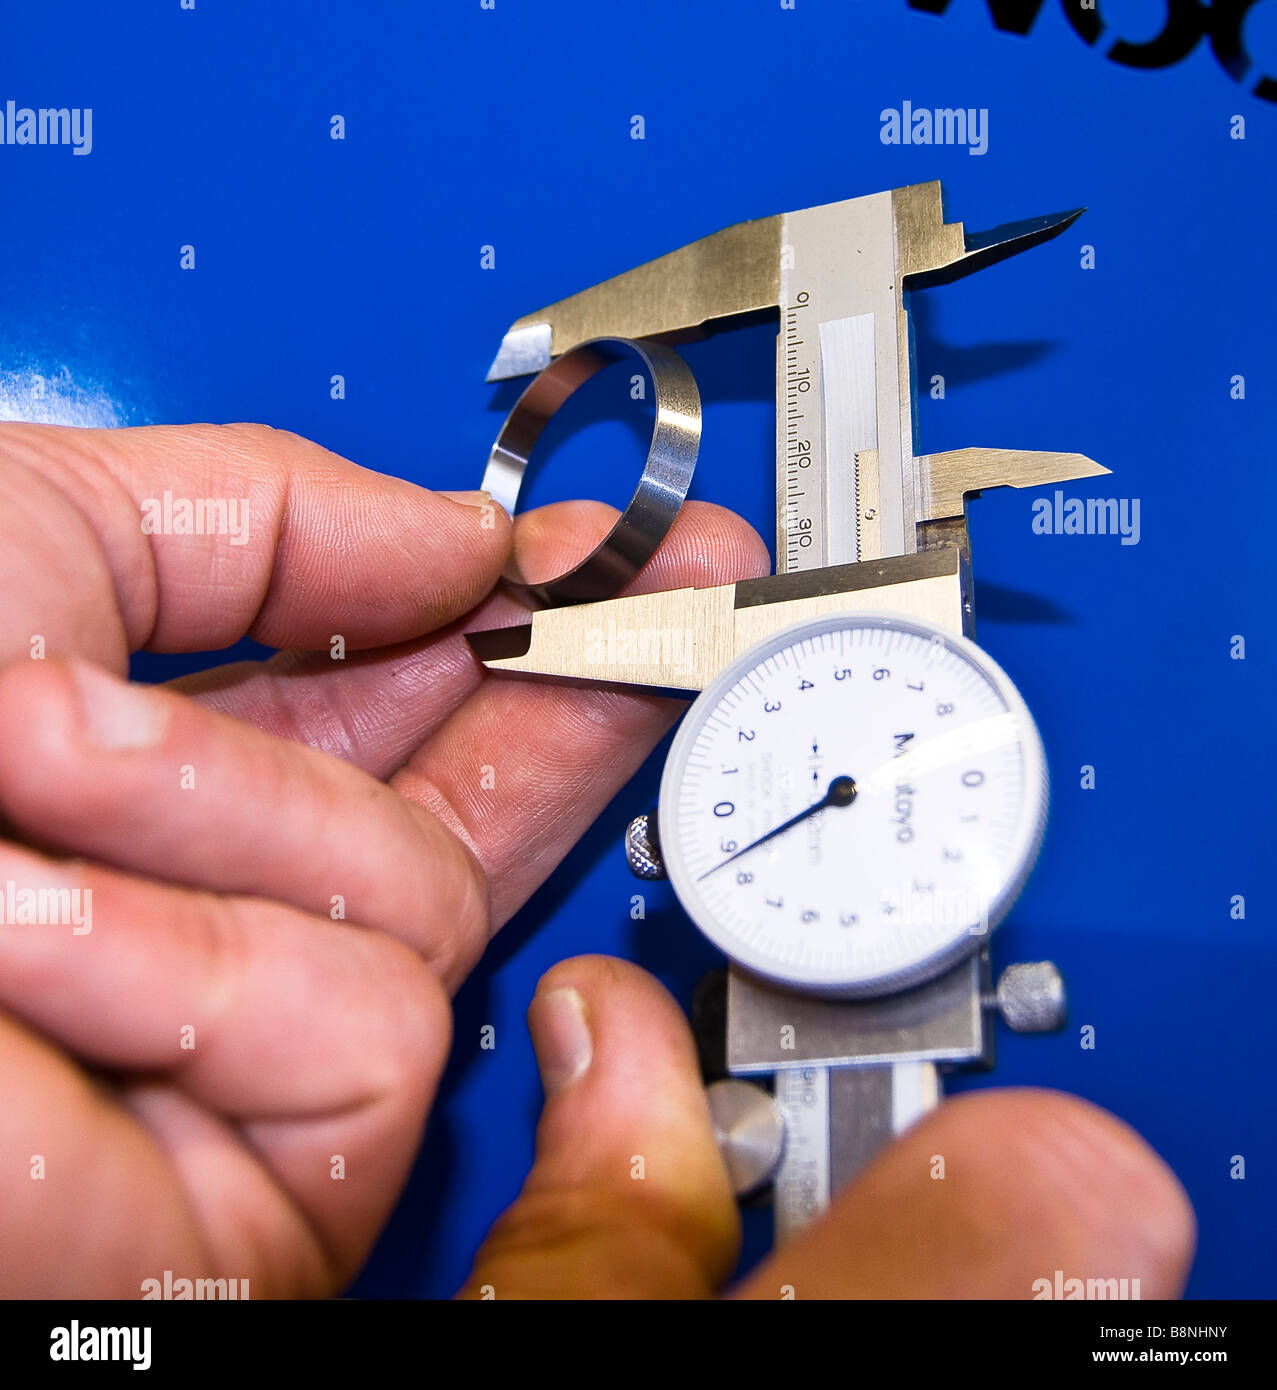 Measuring workpiece - Stock Image